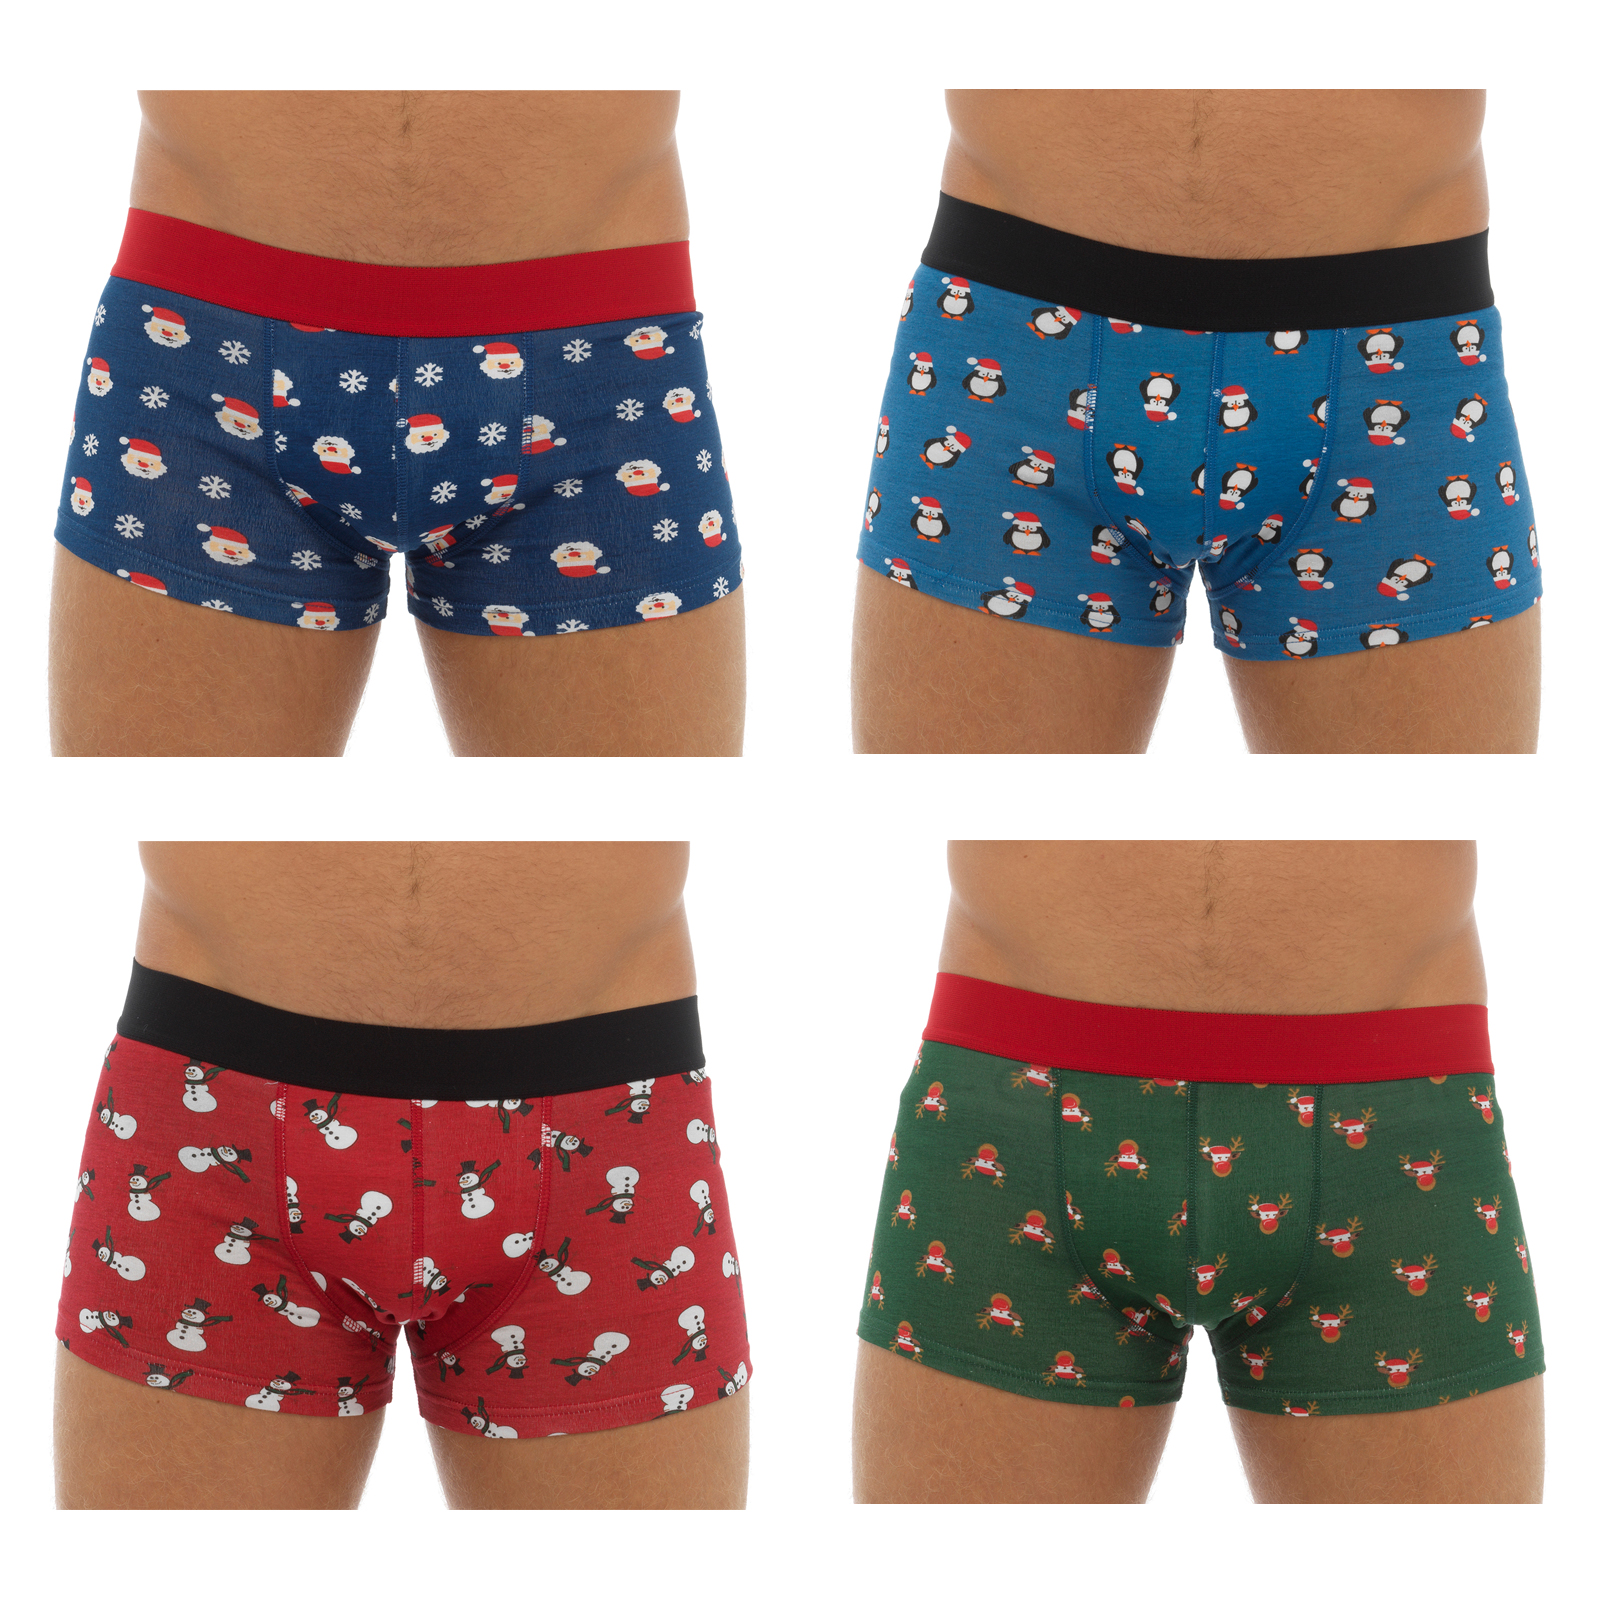 ... Novelty Cotton Stretch Christmas Boxers Underwear Secret Santa Gift